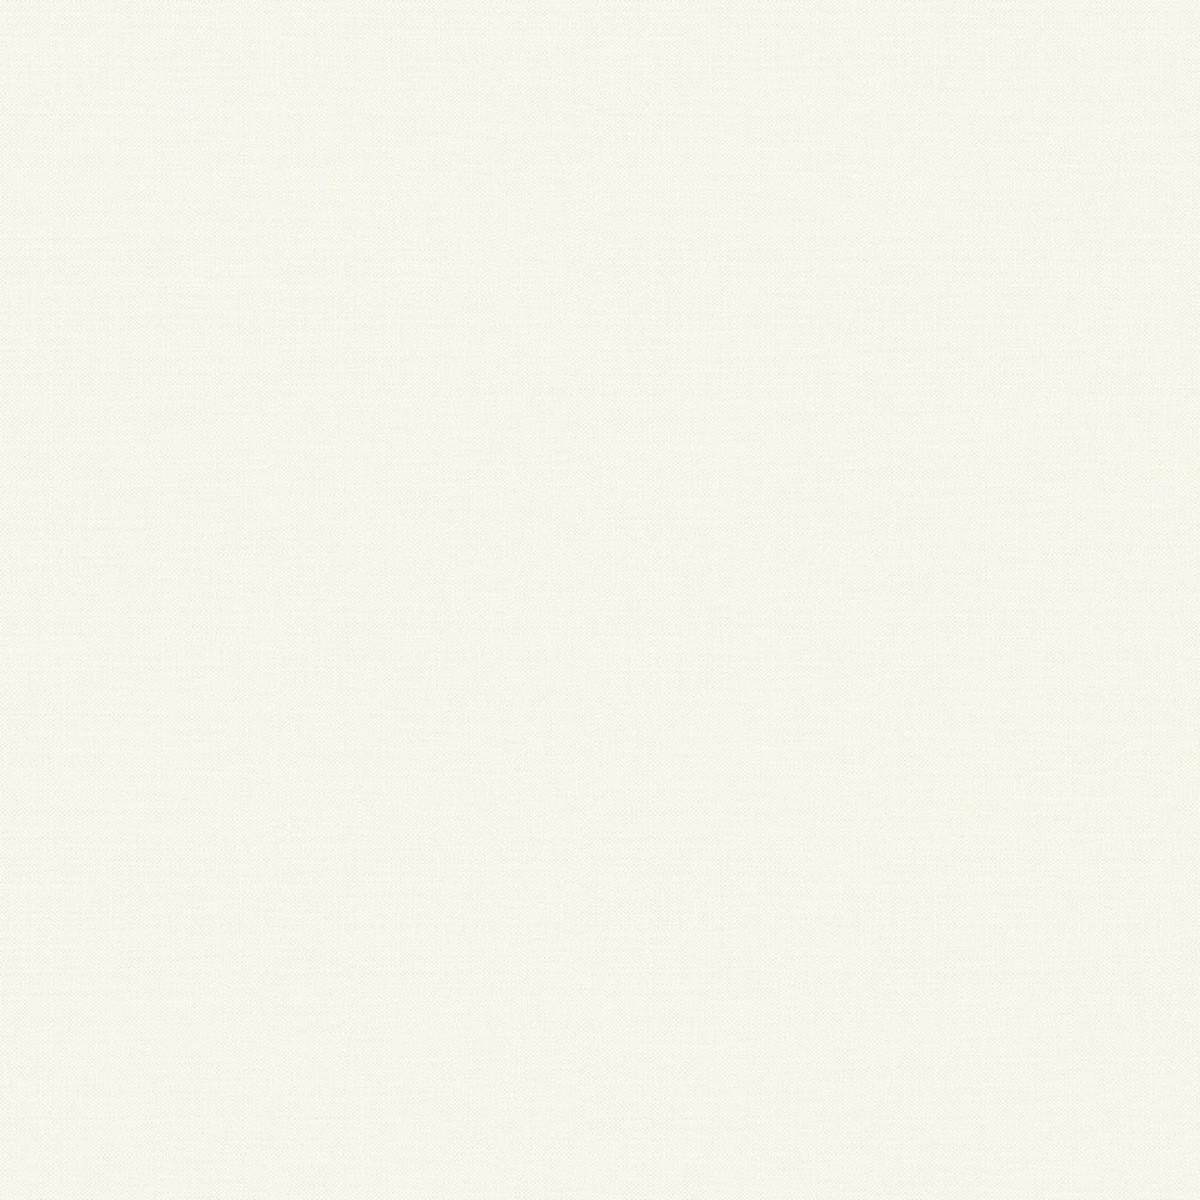 Обои флизелиновые Grandeco Painterly белые 0.53 м PY1009